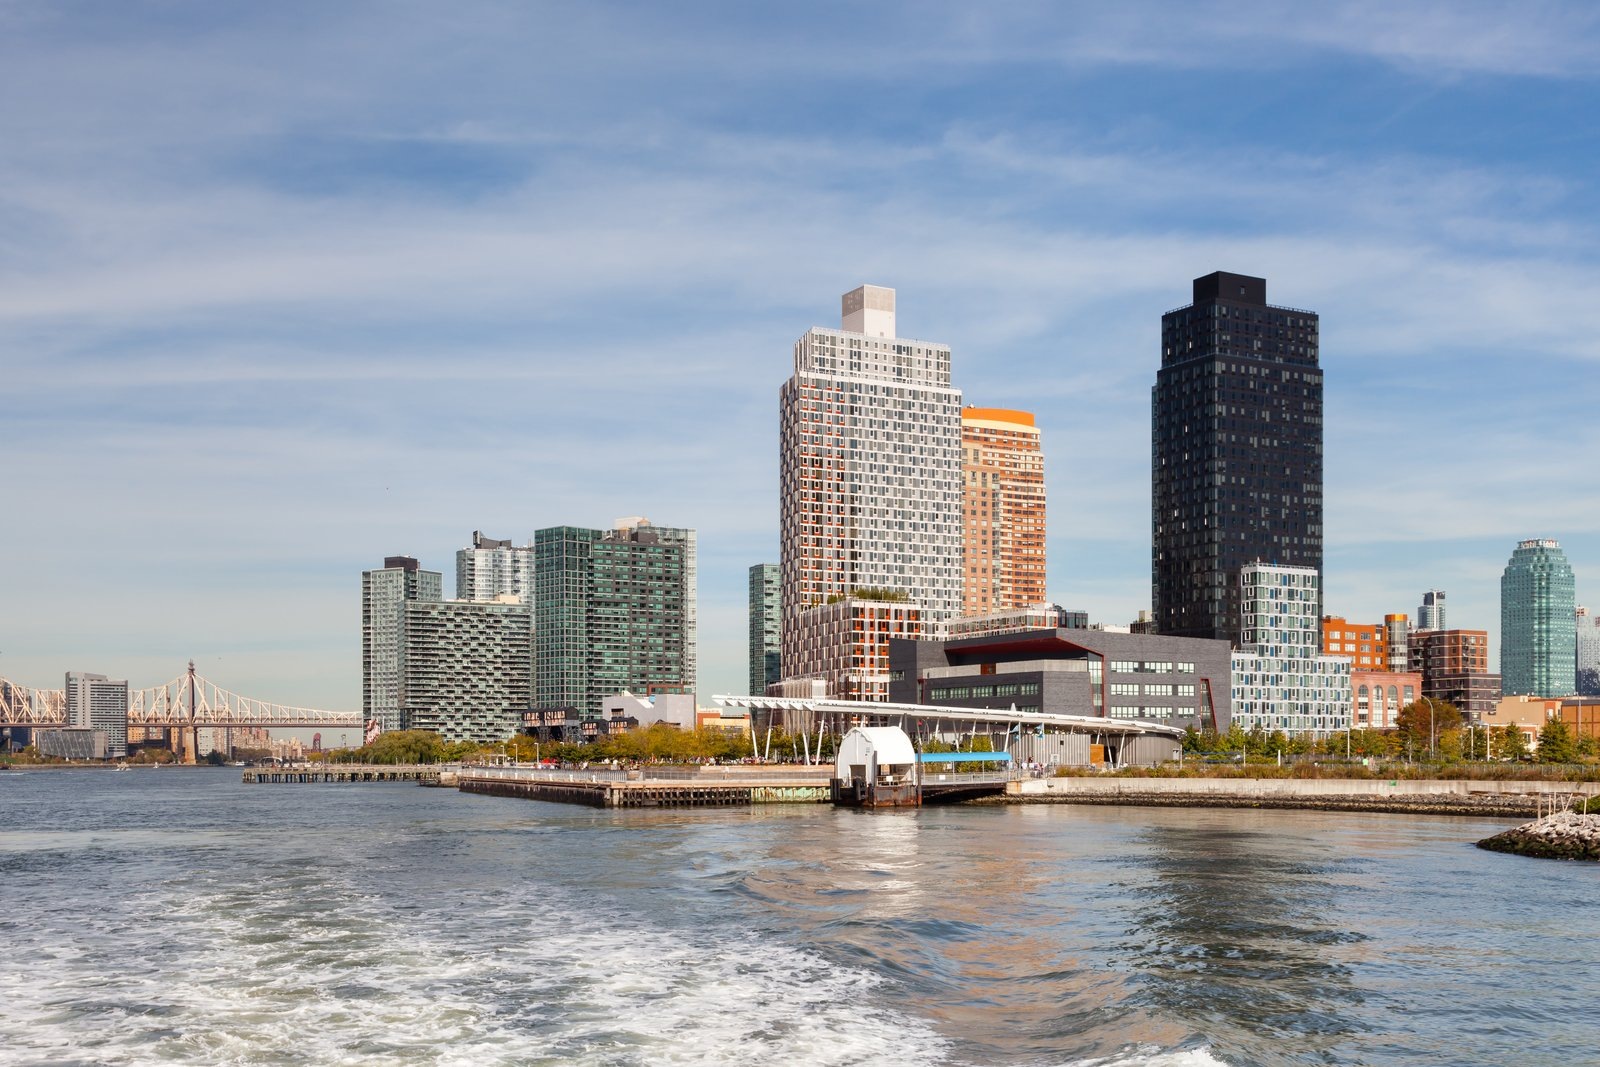 Garden City Long Island, NY Private Investigator